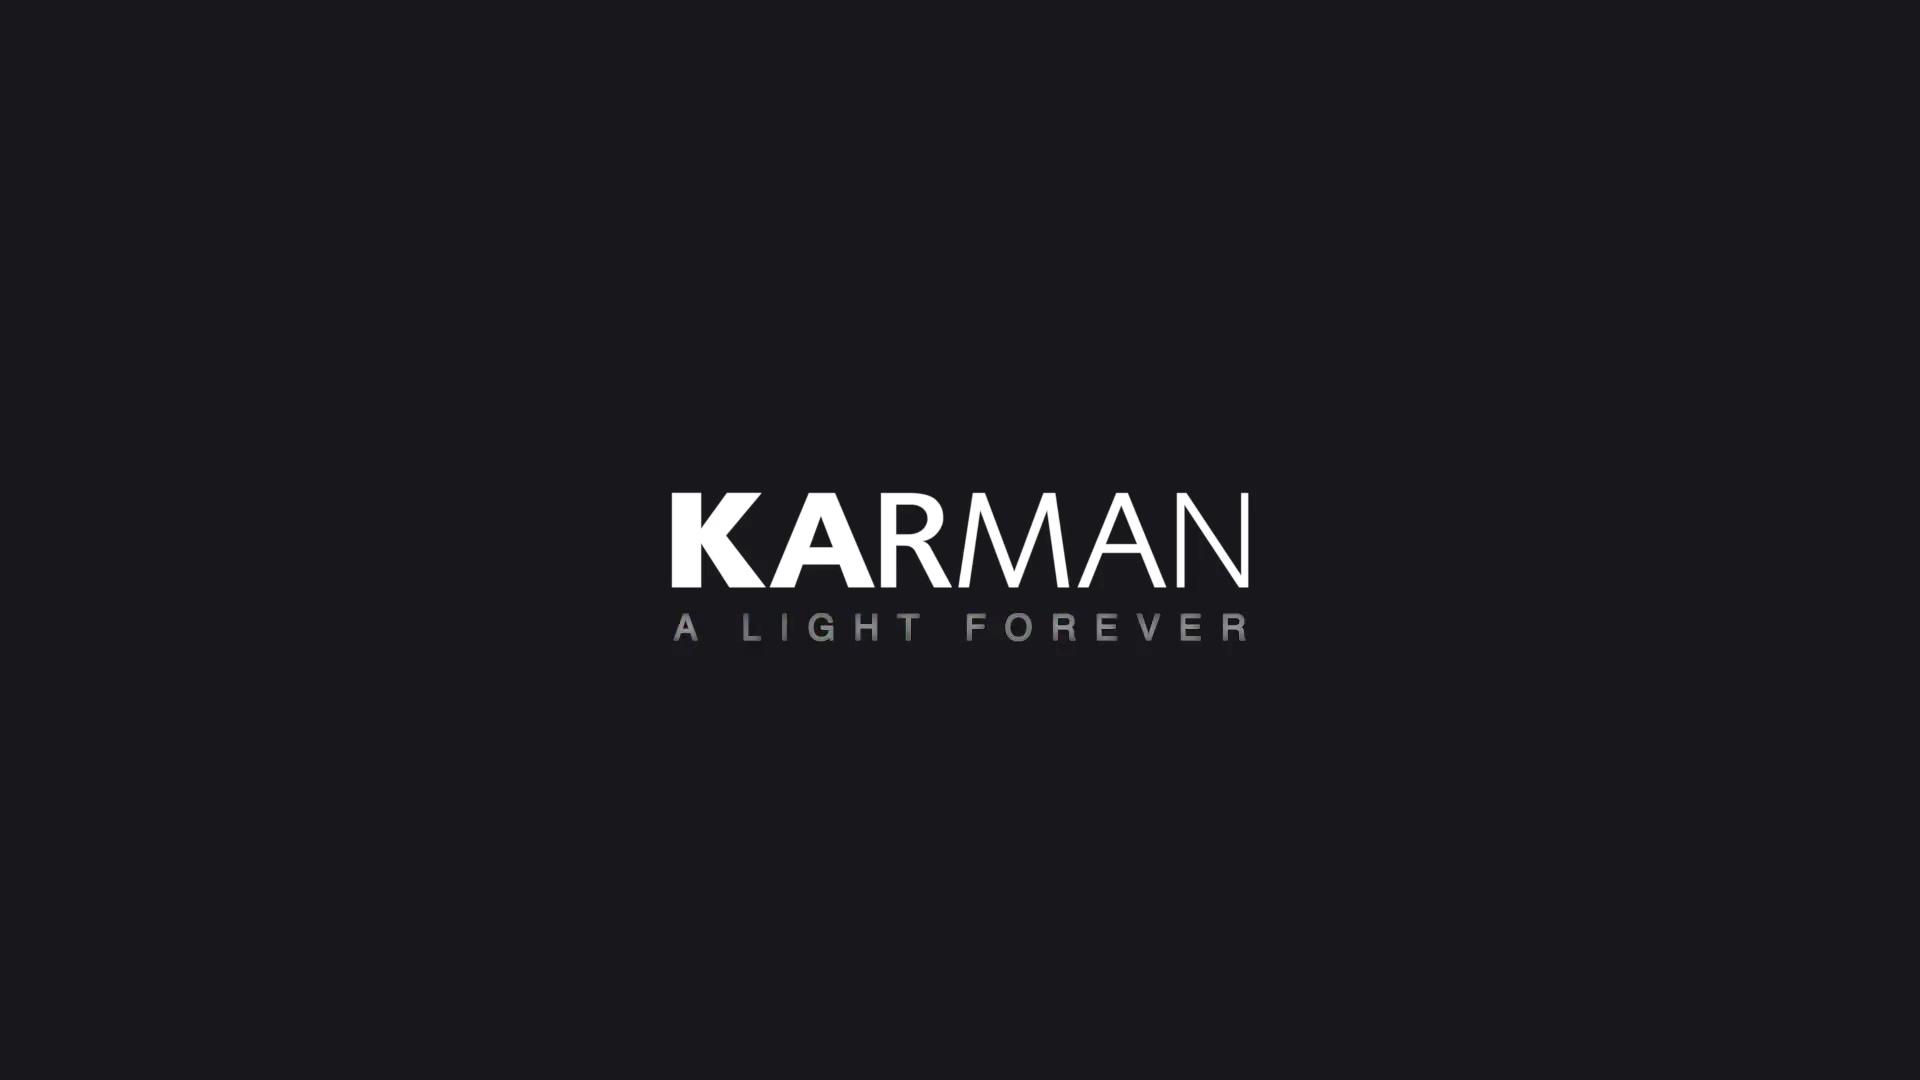 karman-4-prodotti